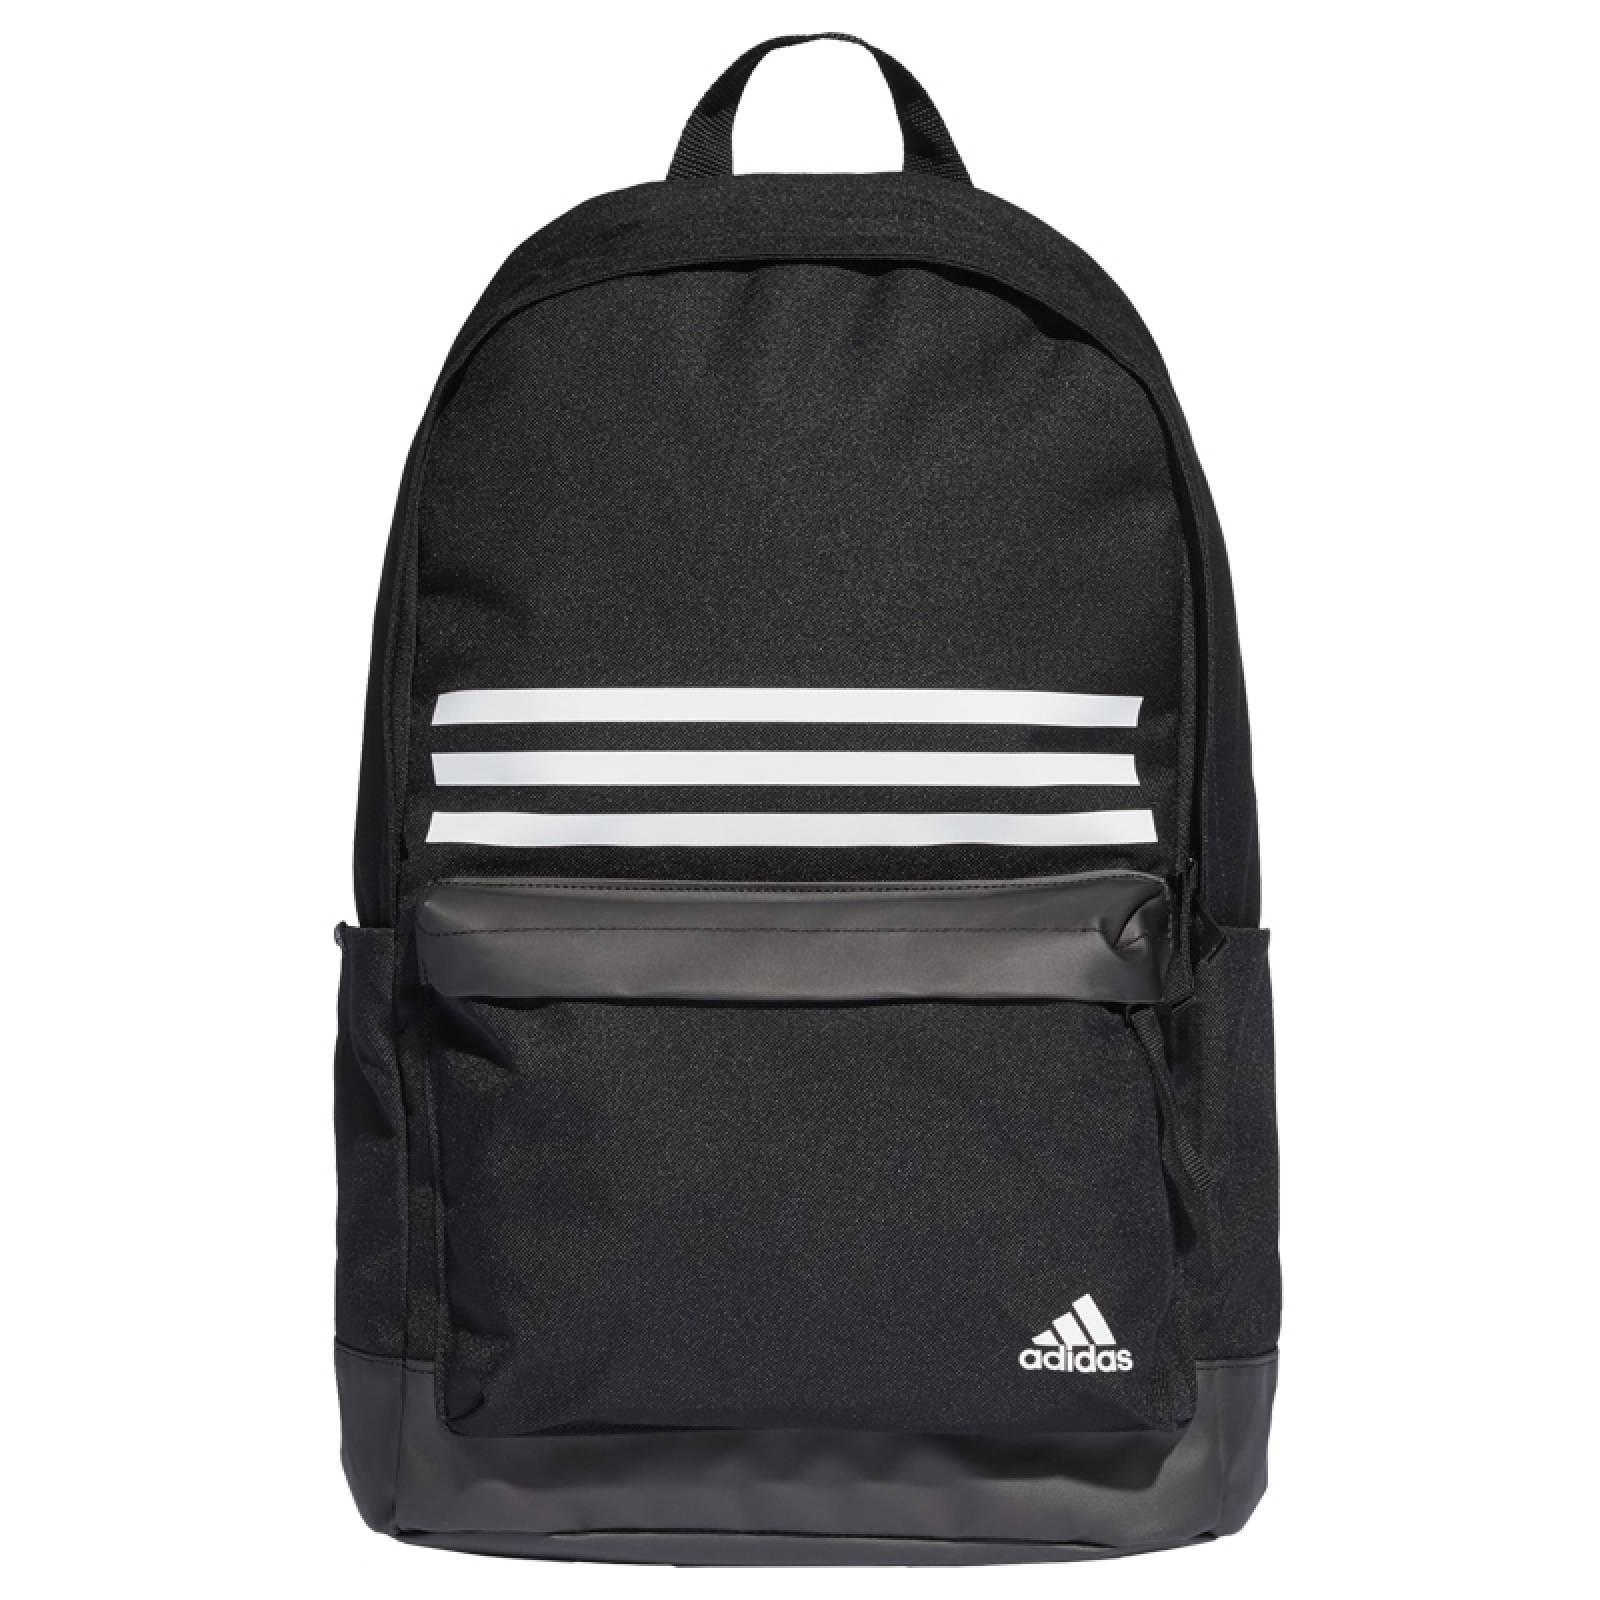 Adidas Classic 3 Stripes Pocket